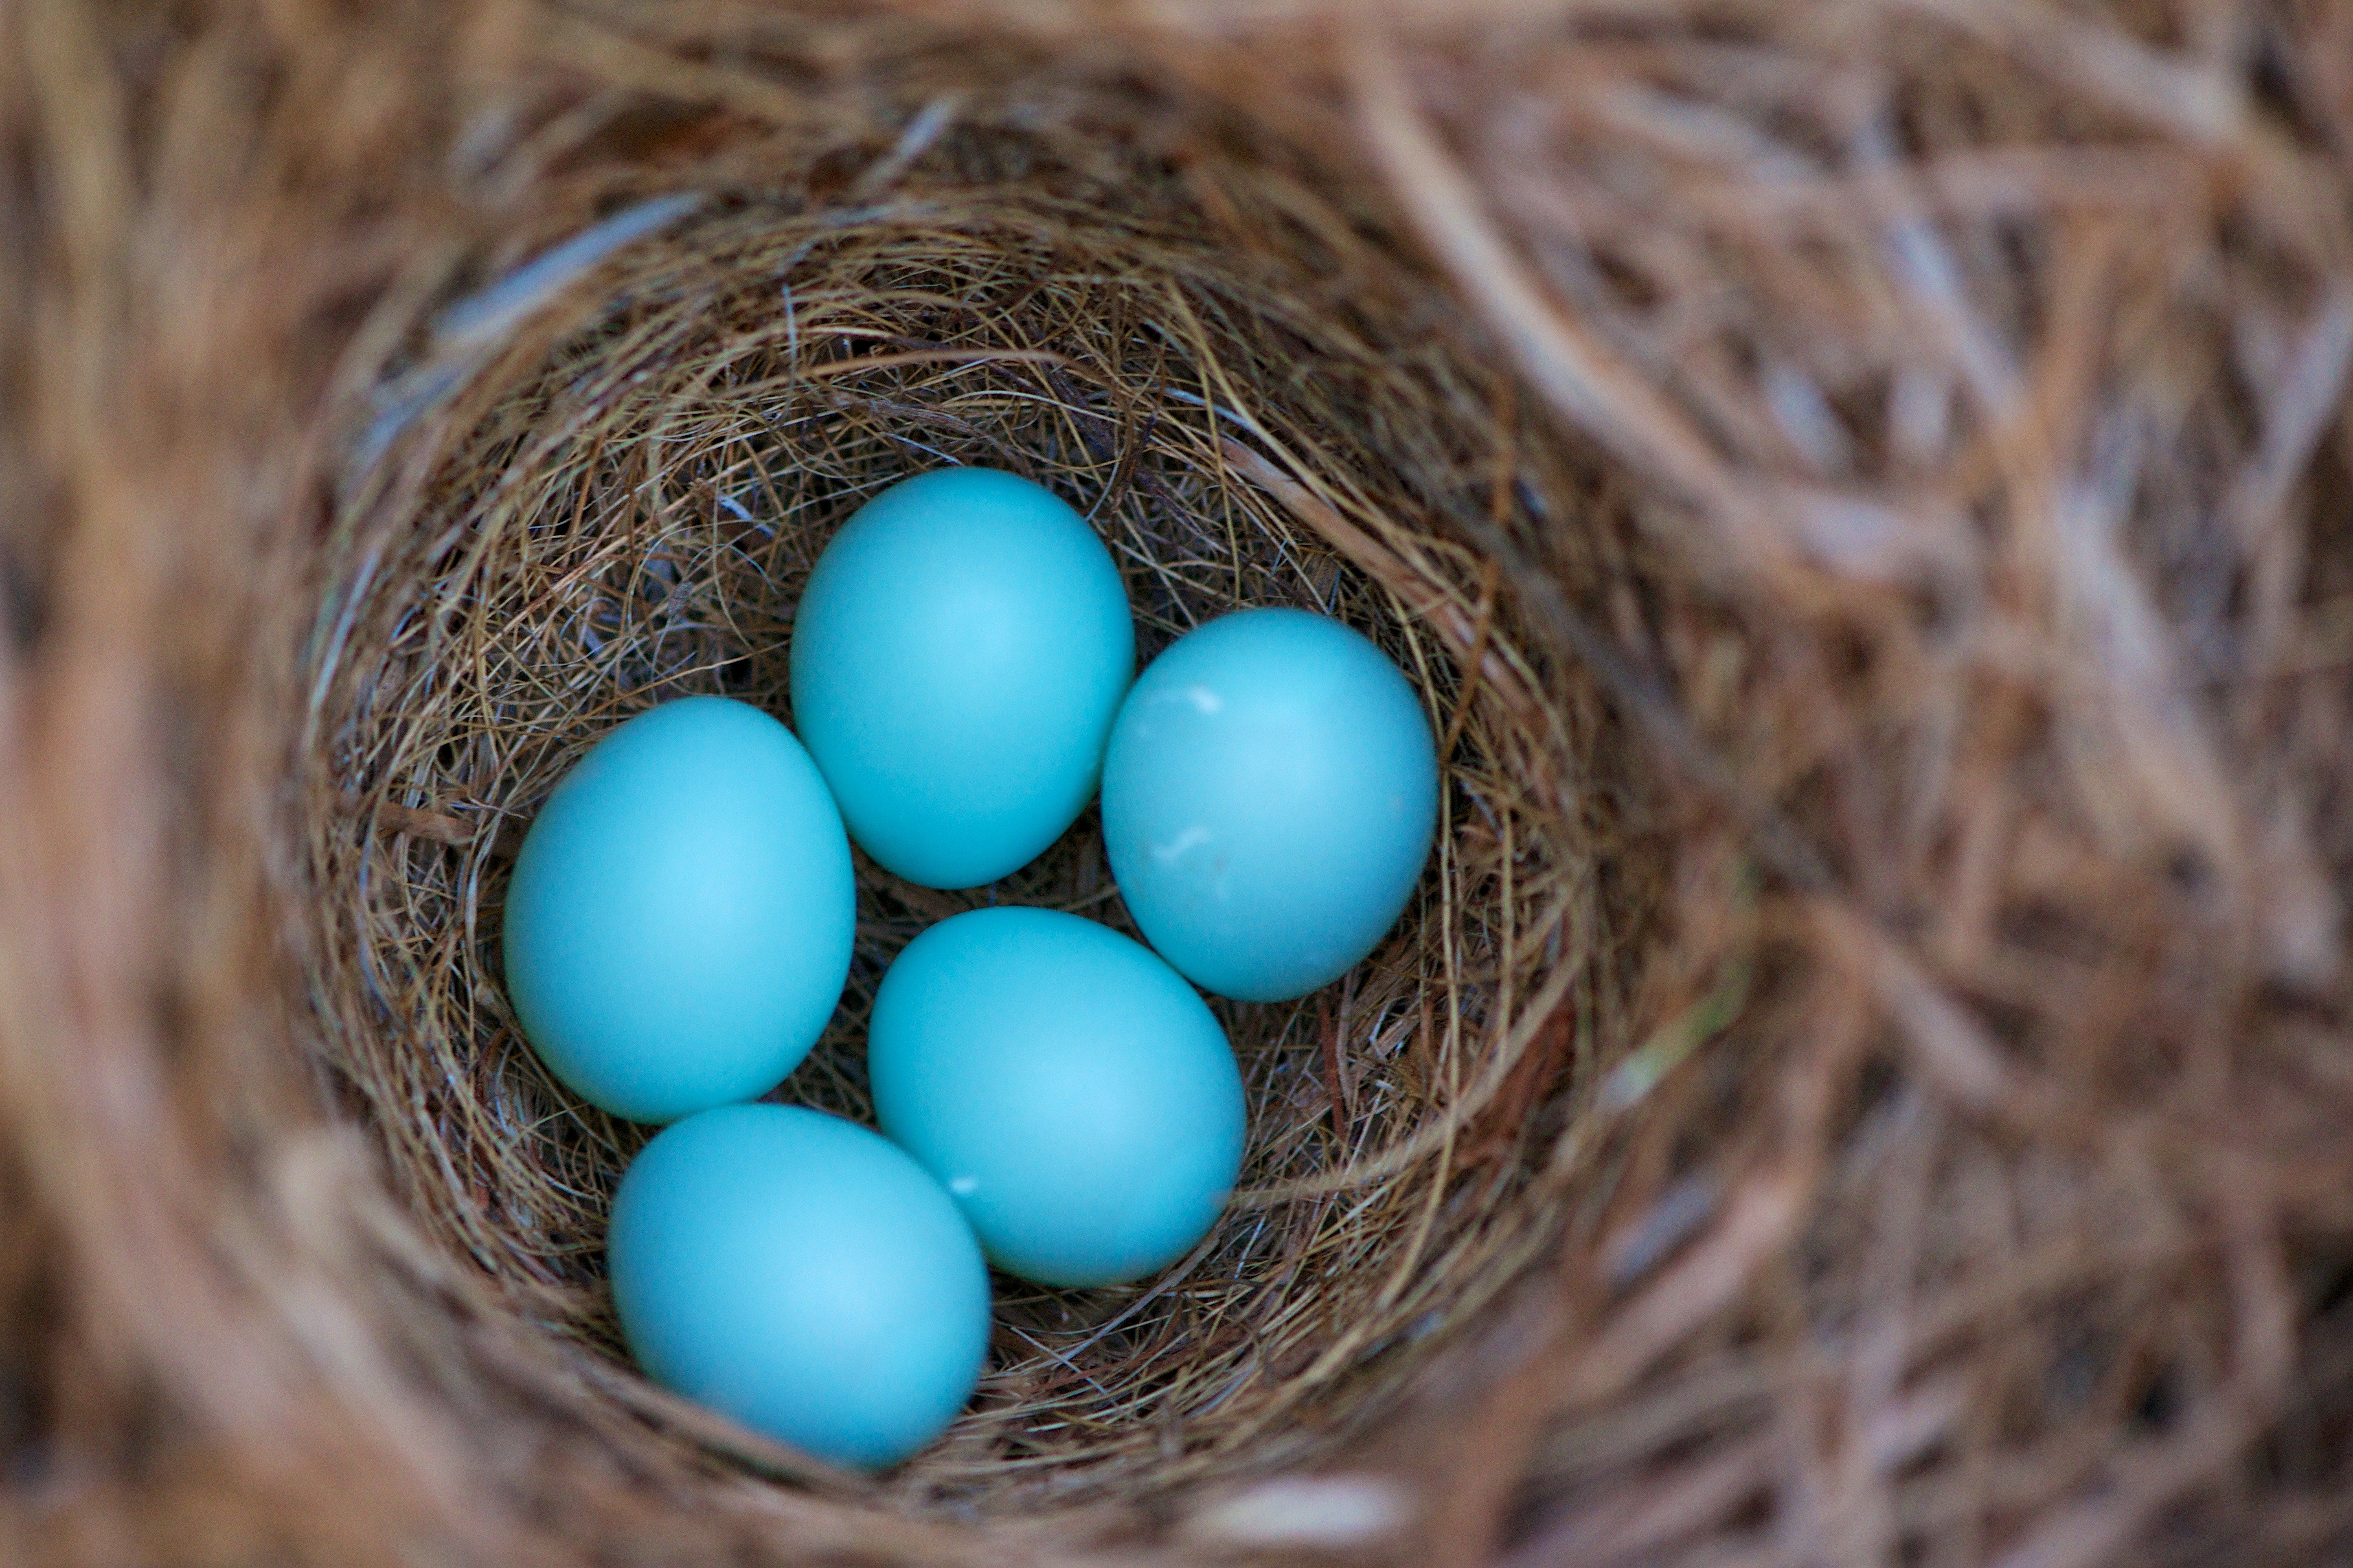 A bird's nest with five blue eggs.